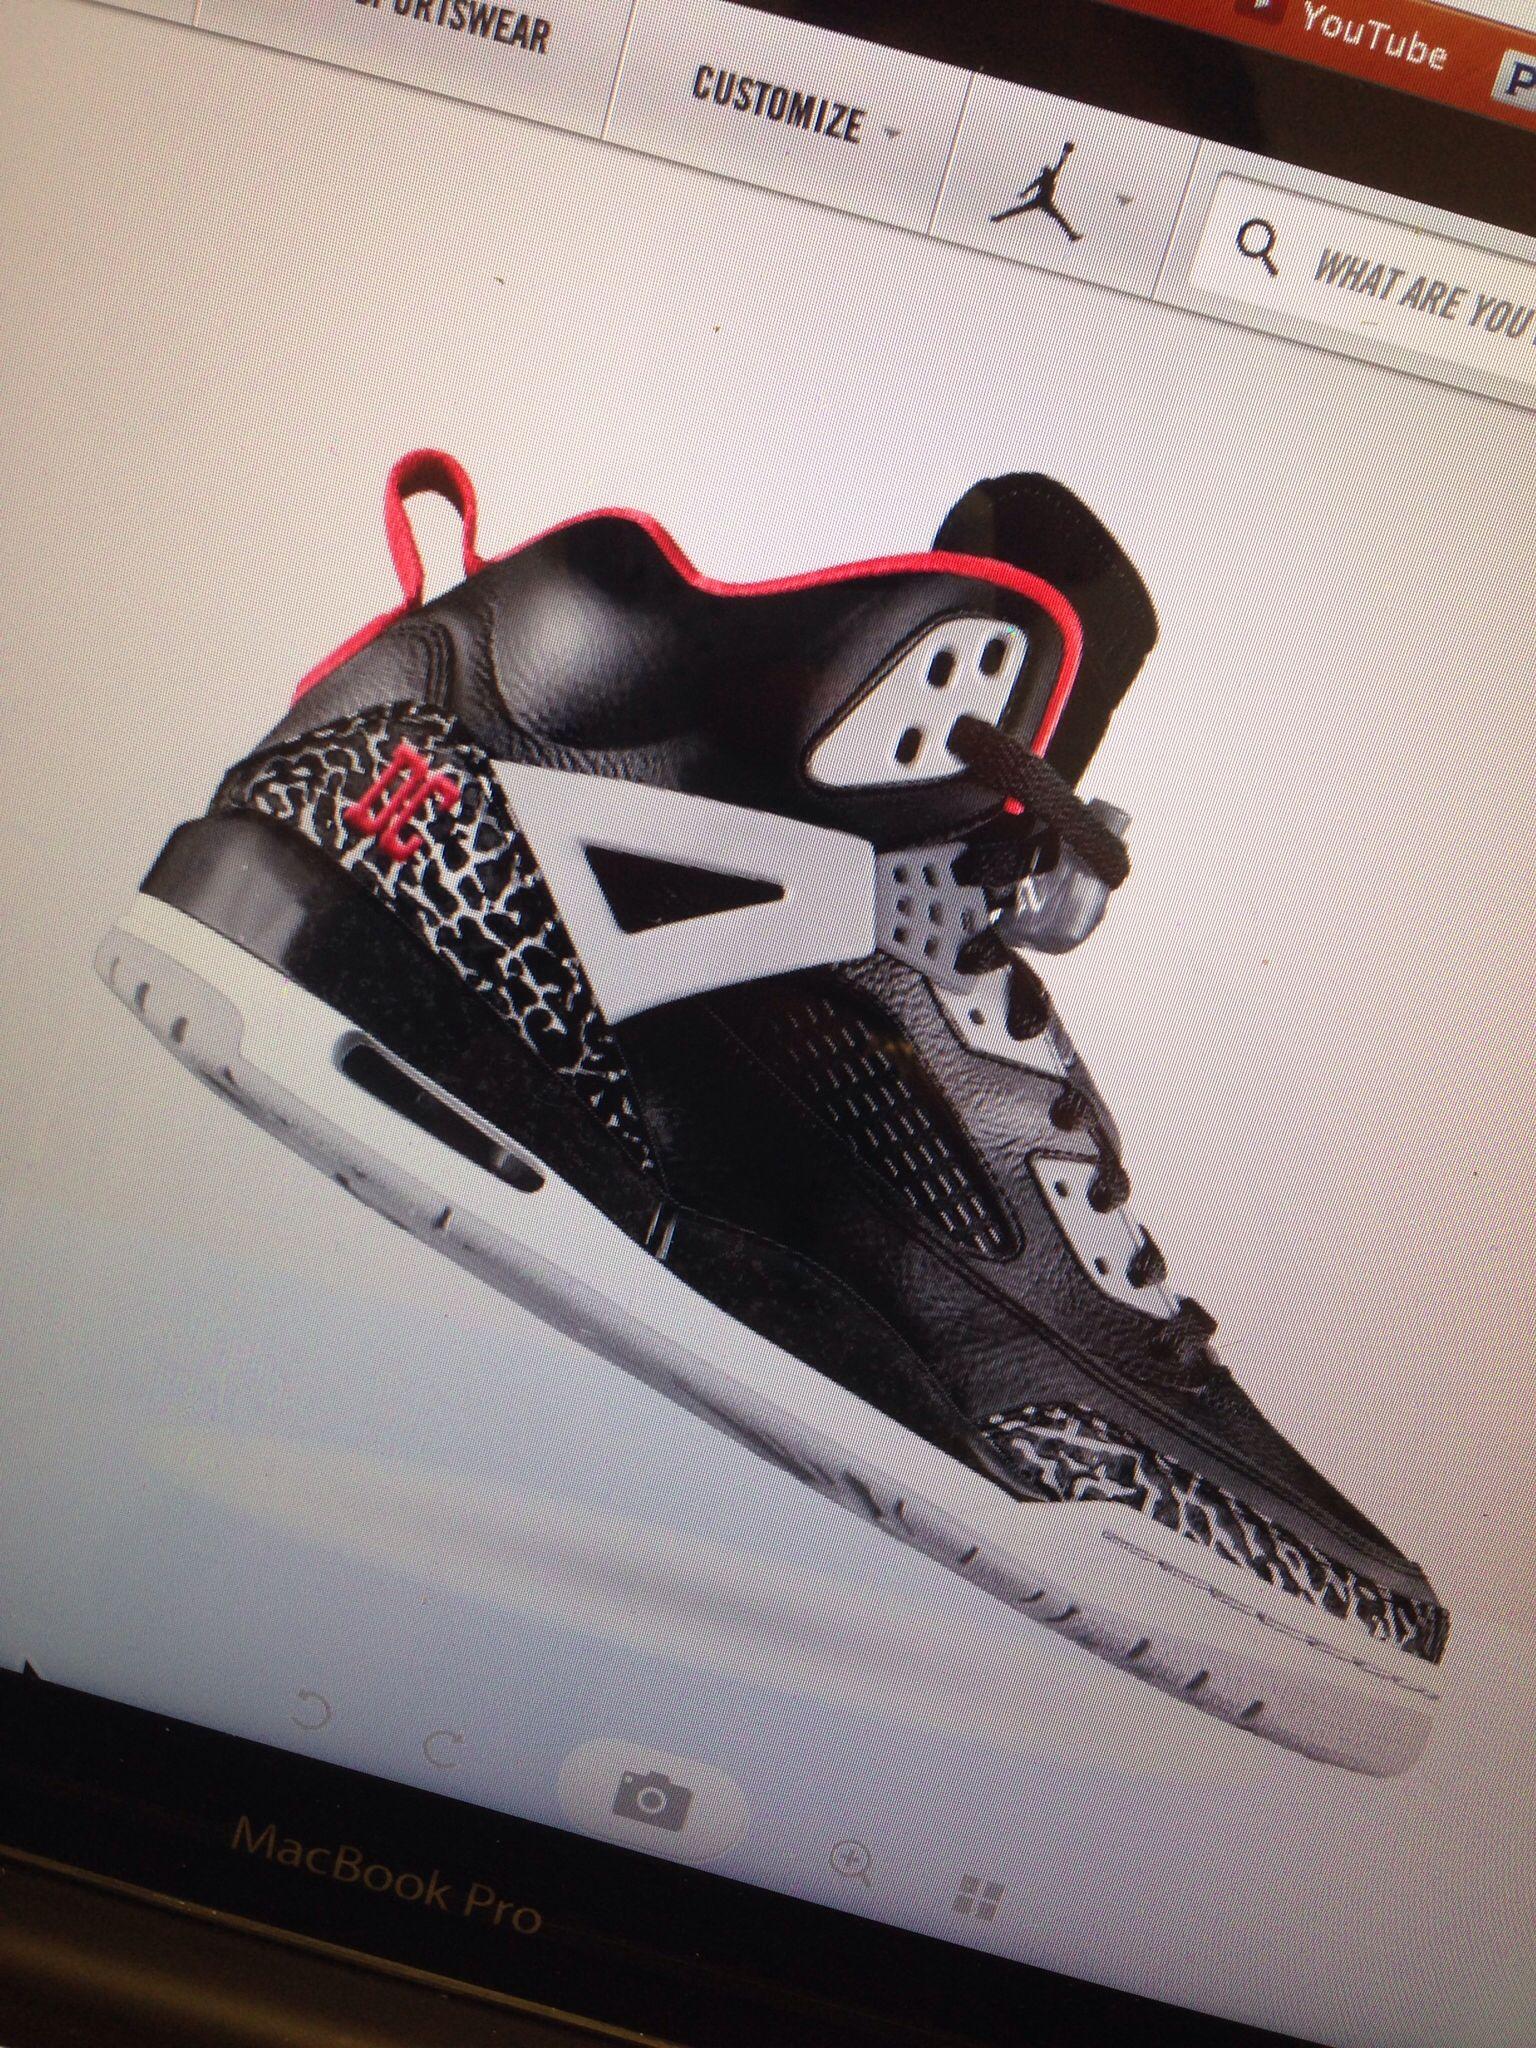 santo Abrasivo raqueta  My custom Nike Air Jordan Spizike kicks...DC special #AirJordan Nike ID    Air jordans, Nike id, Nike air